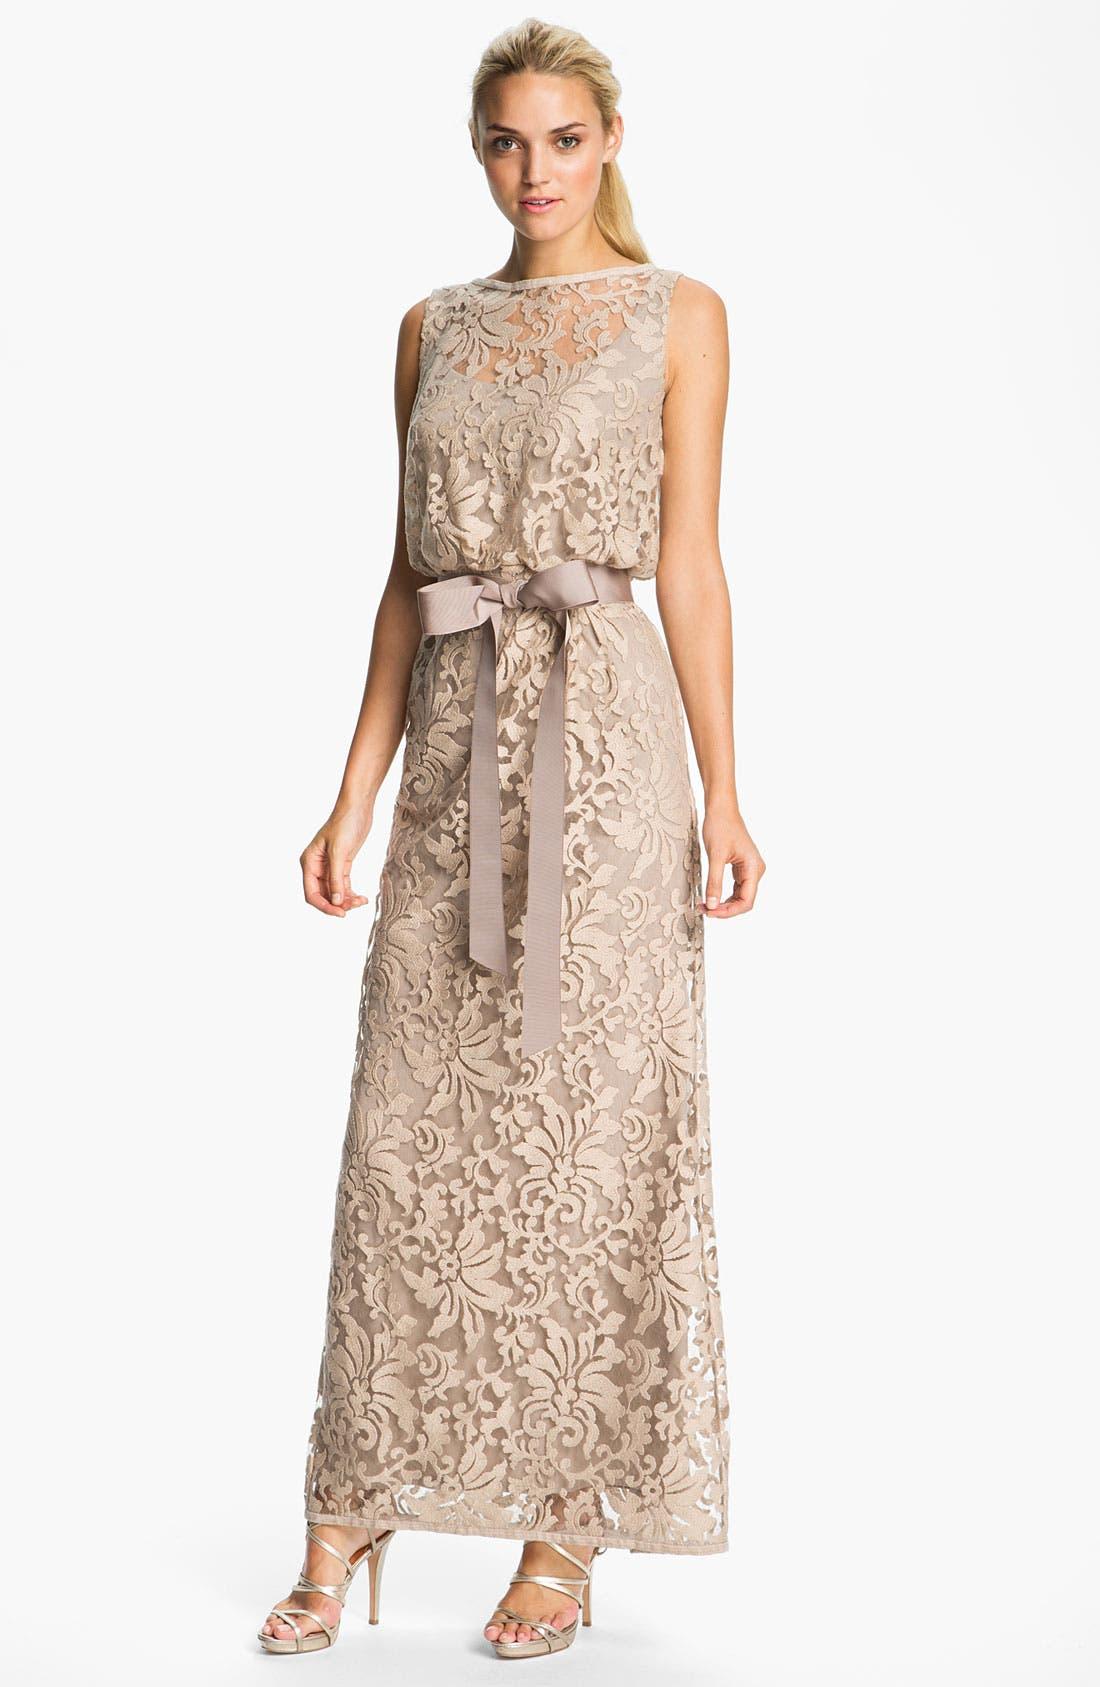 Alternate Image 1 Selected - Tadashi Shoji Lace Overlay Blouson Gown